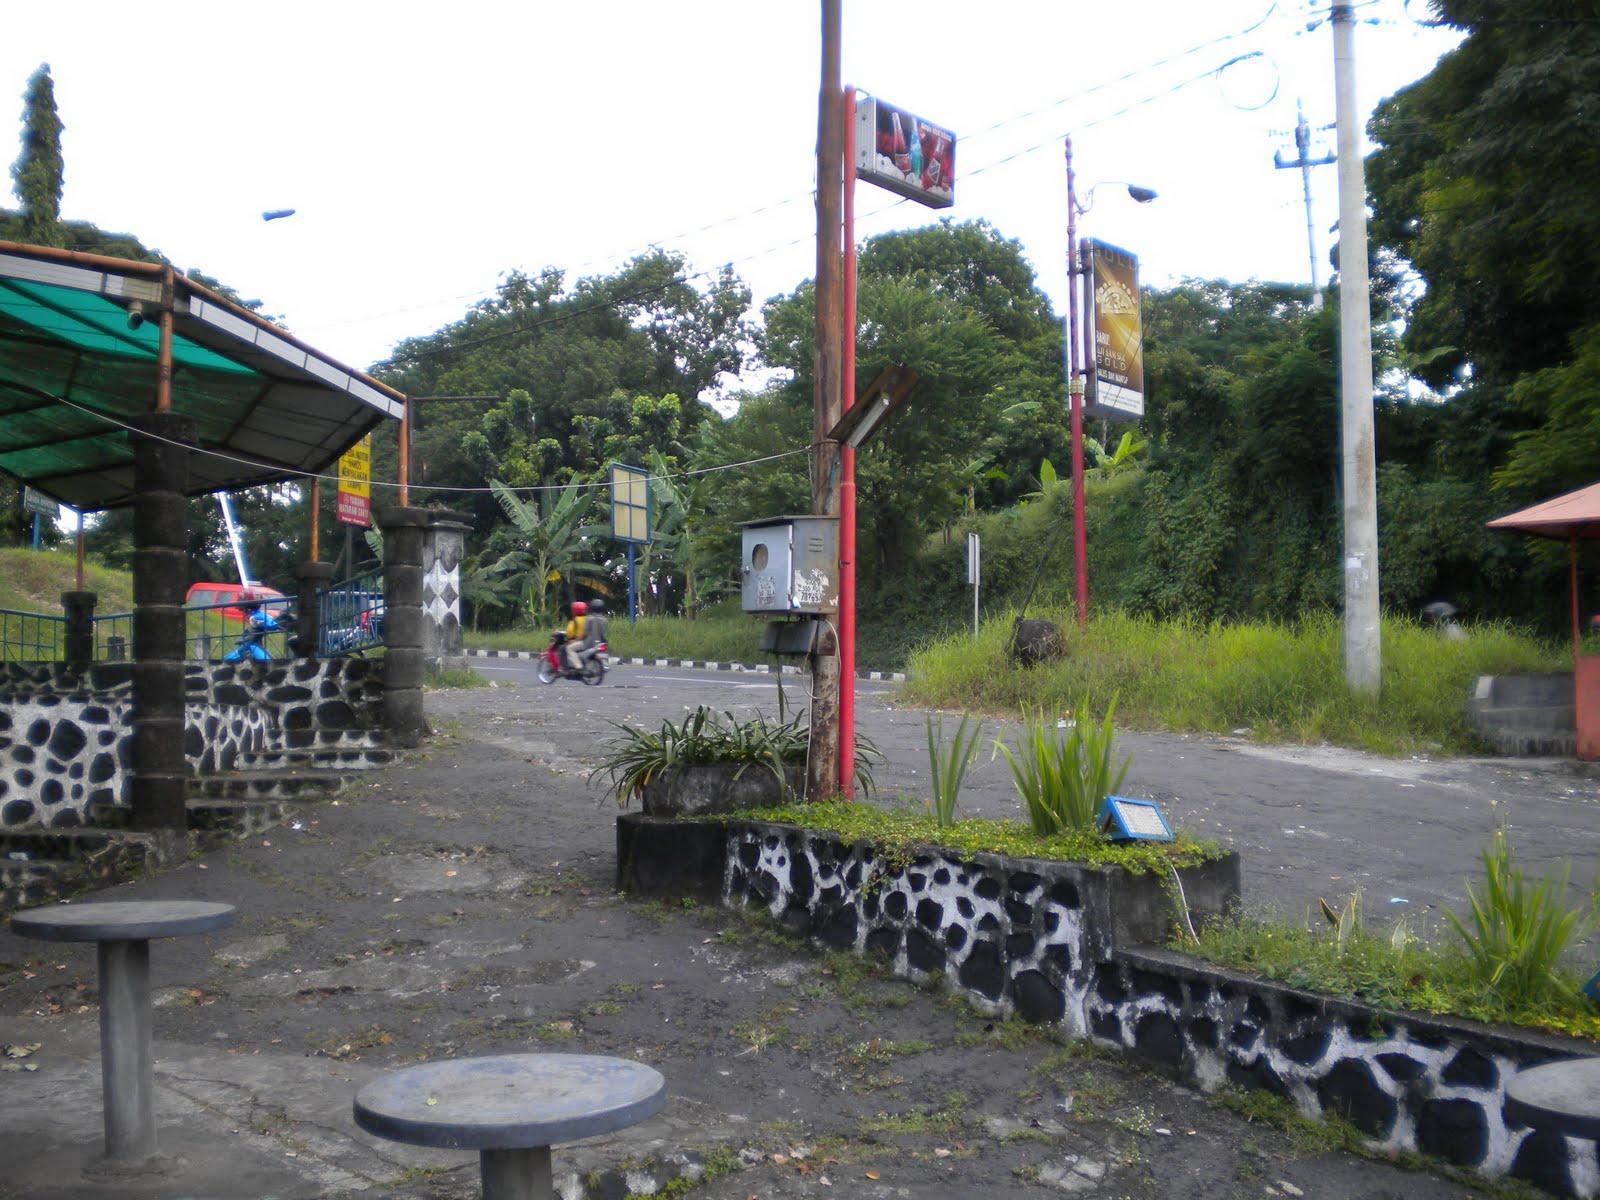 Tempat Angker Dan Misteri Tanjakan Gombel Semarang